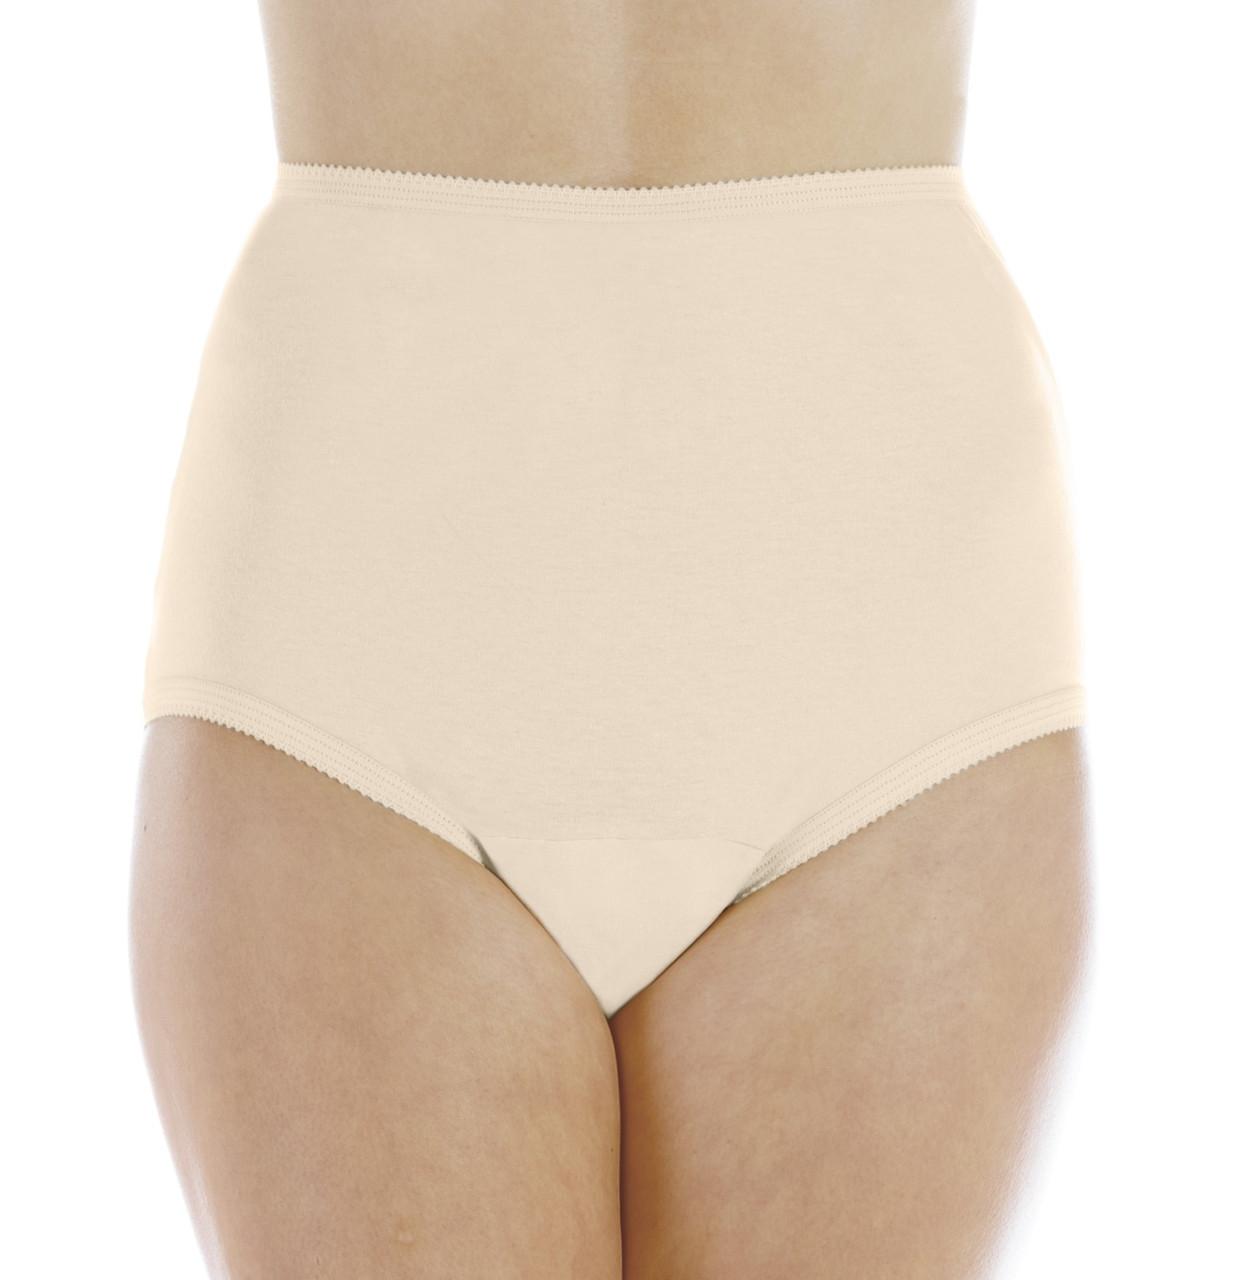 7b9af2072c9e Cotton Comfort Panty - Wearever Incontinence